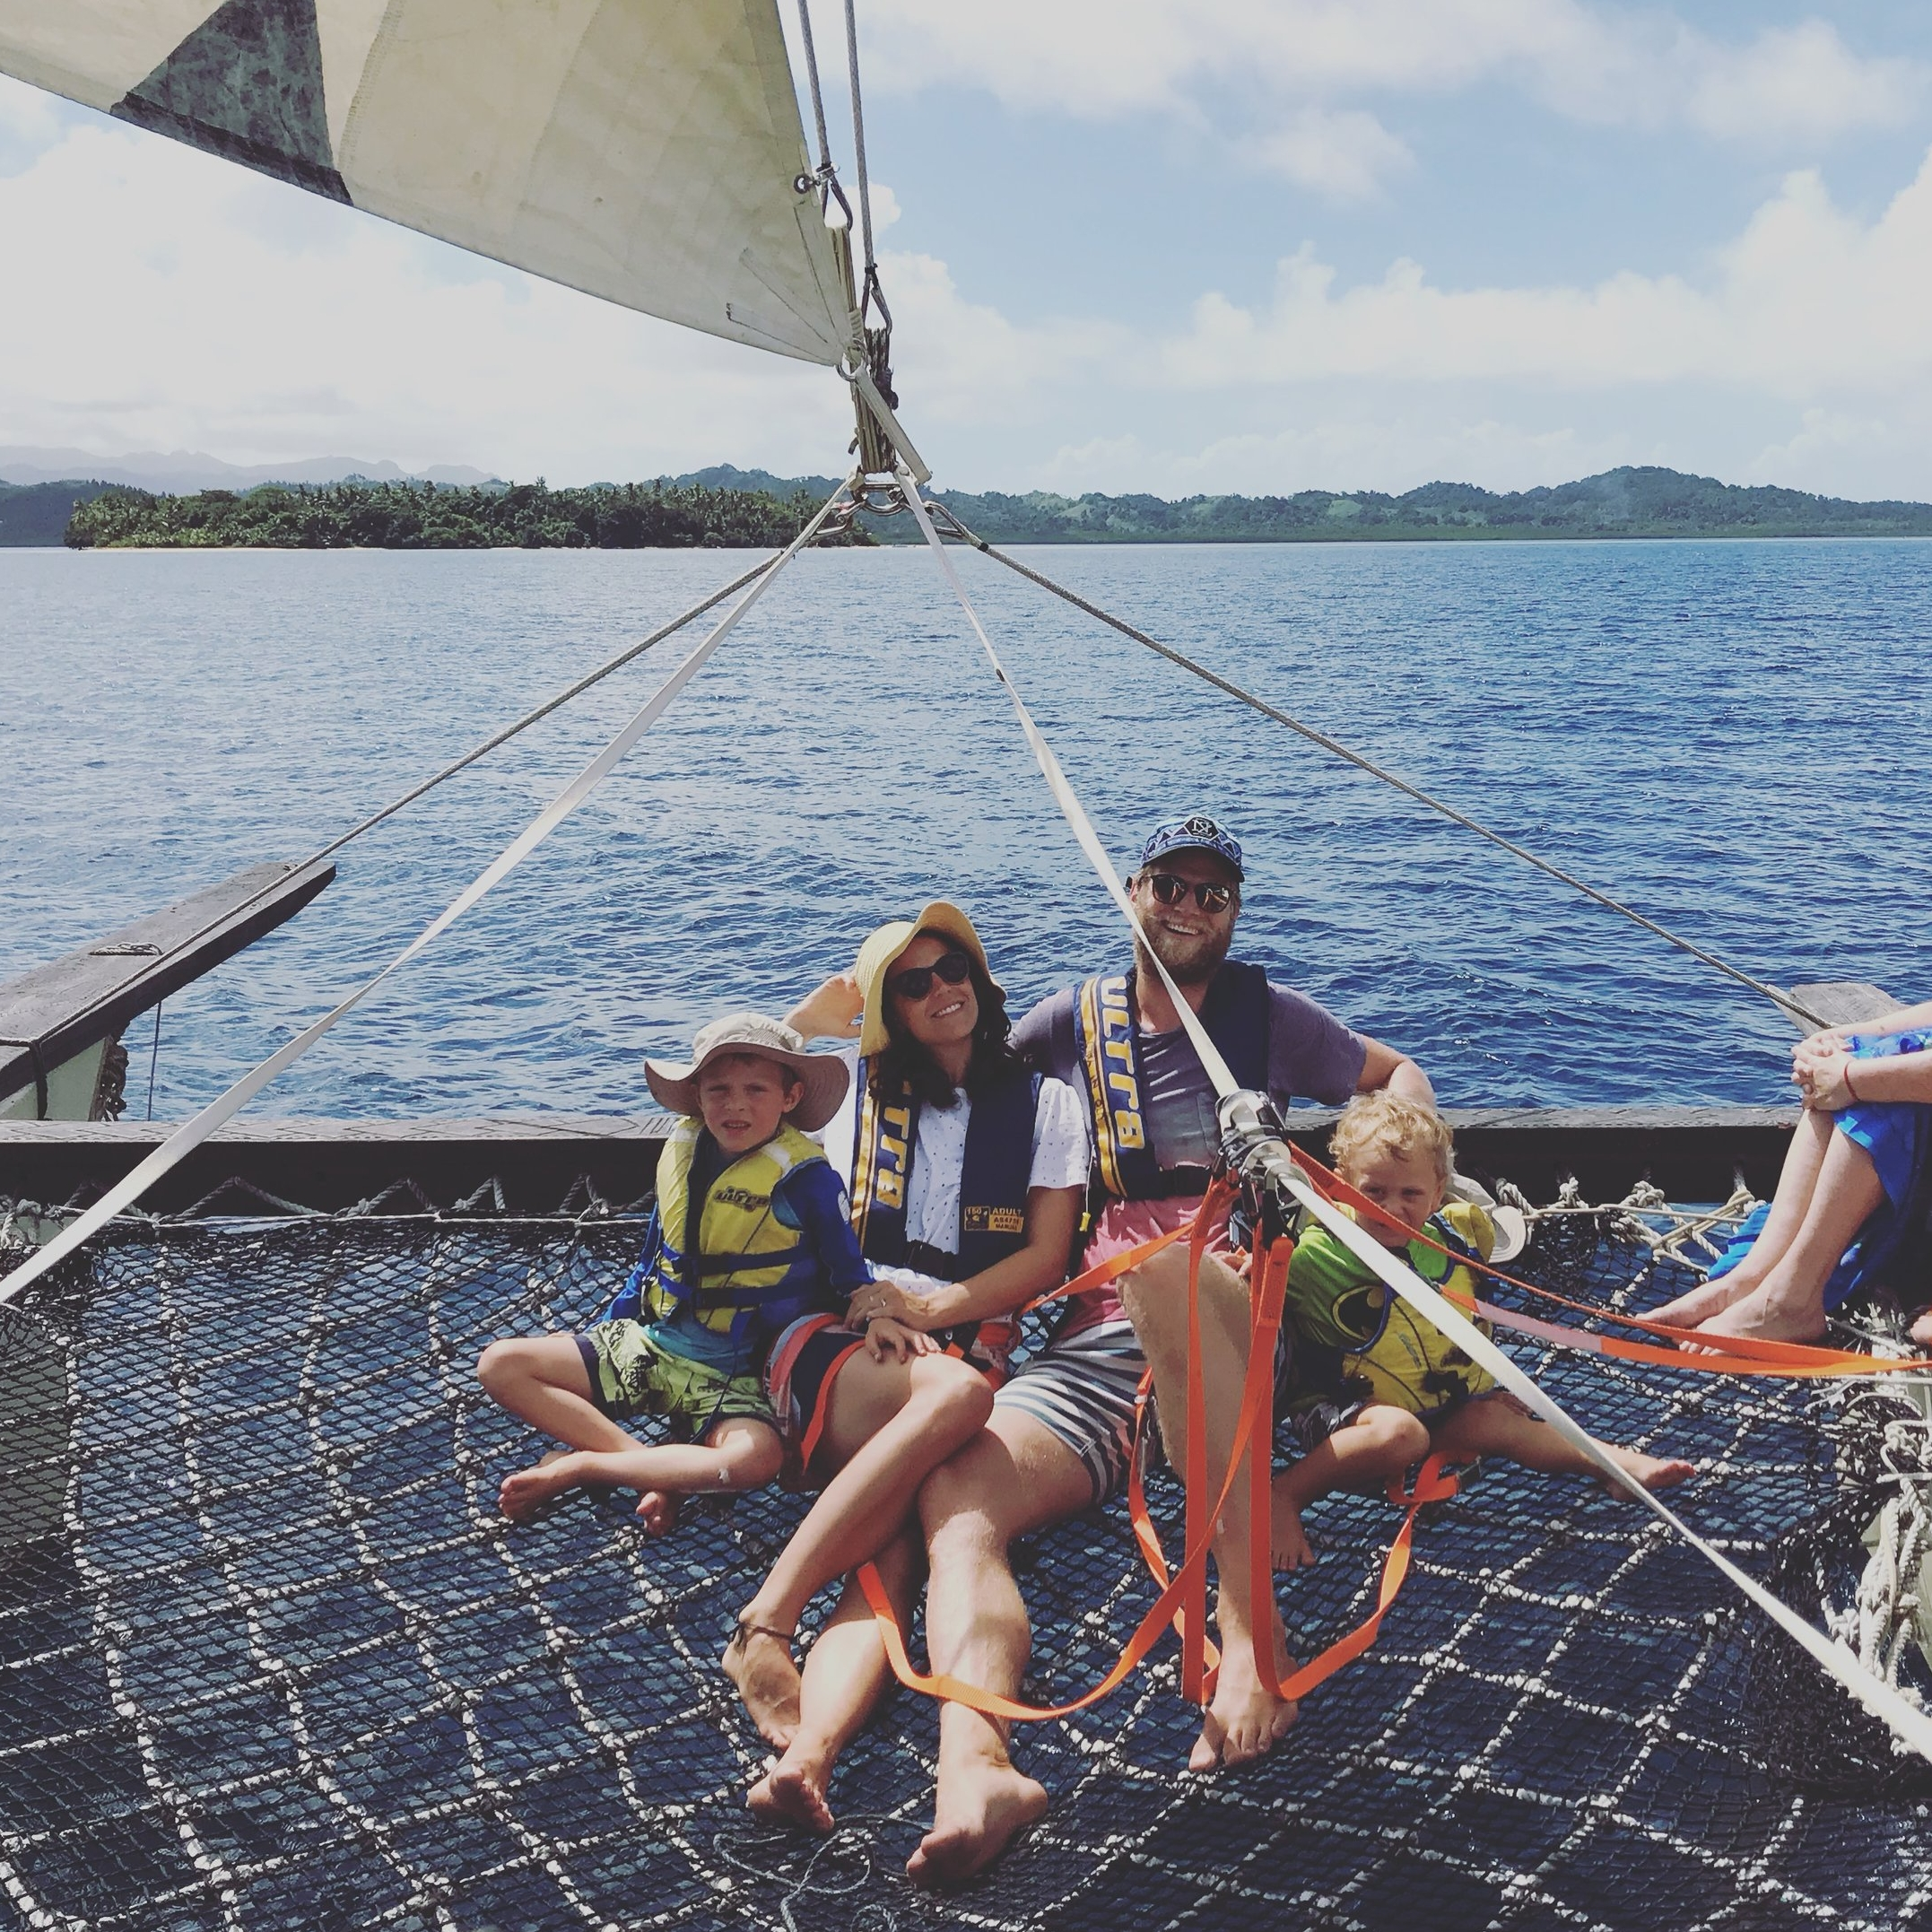 sailing family.JPG